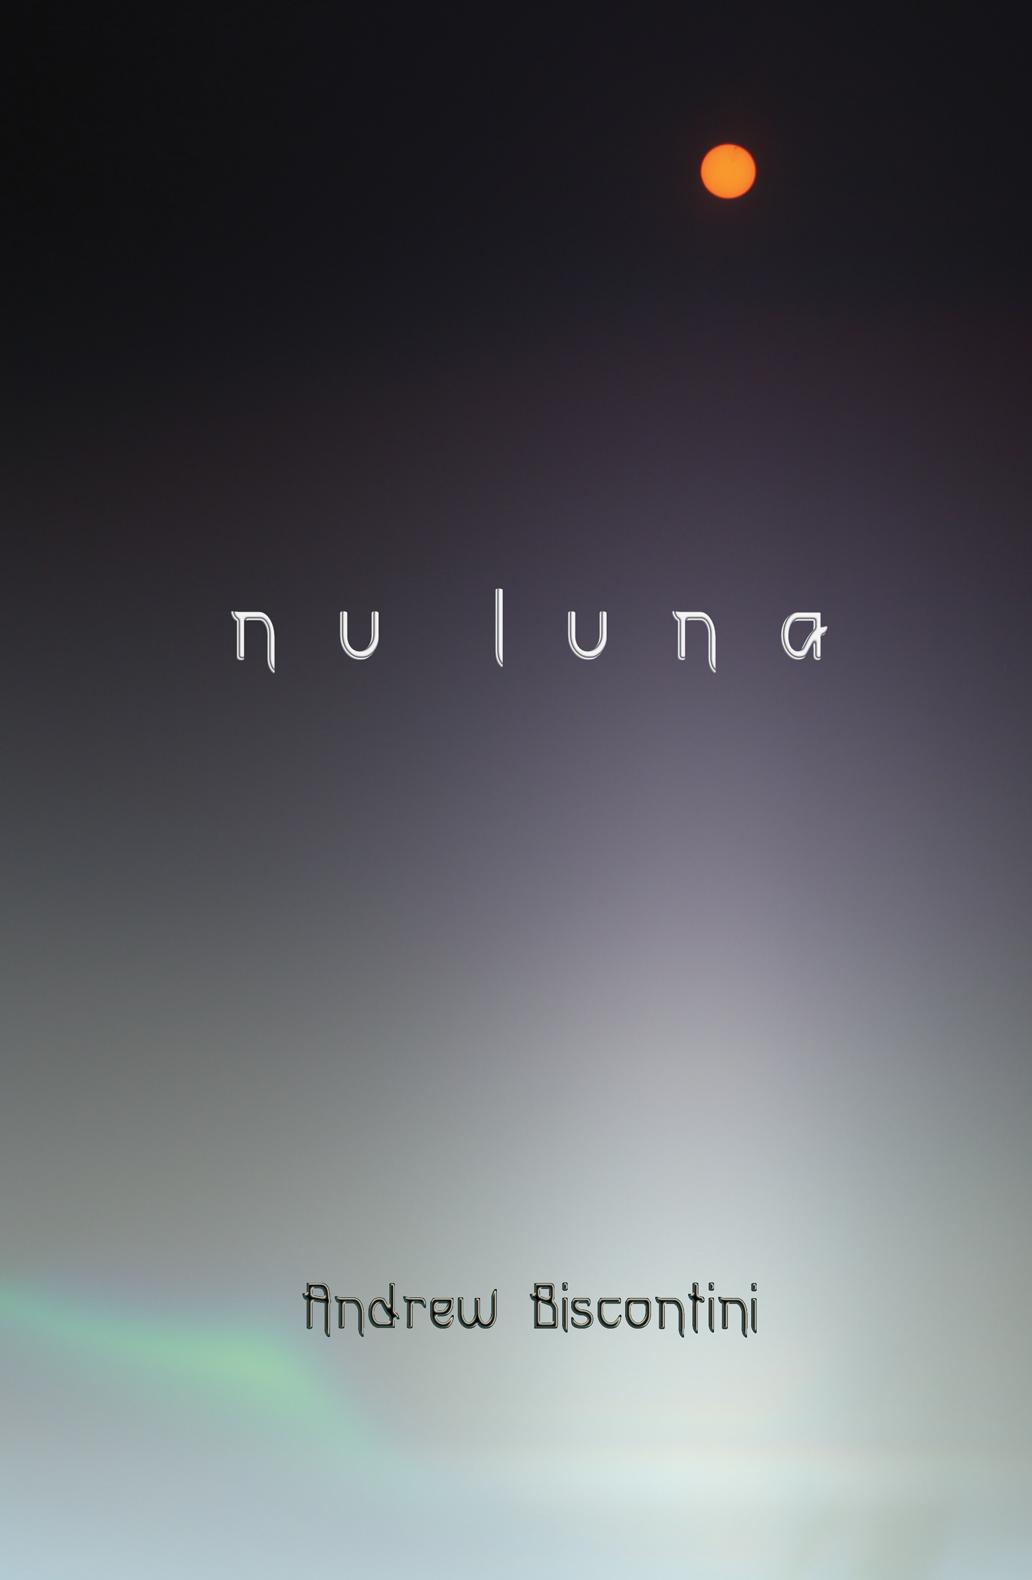 NU LUNA / Andrew Biscontini